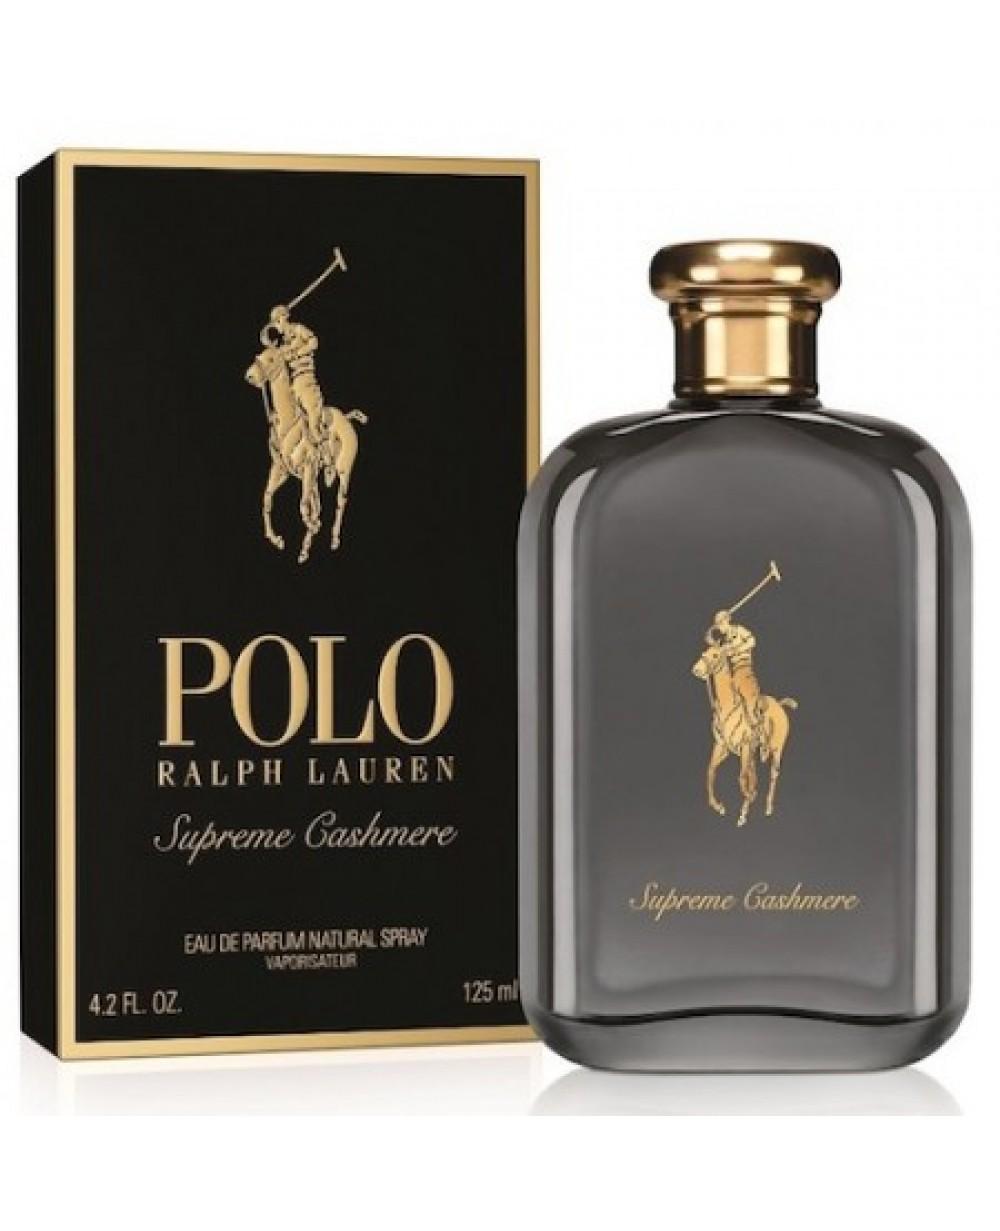 ralph_lauren_polo_supreme_cashmere_edp_125ml_perfume_for_men